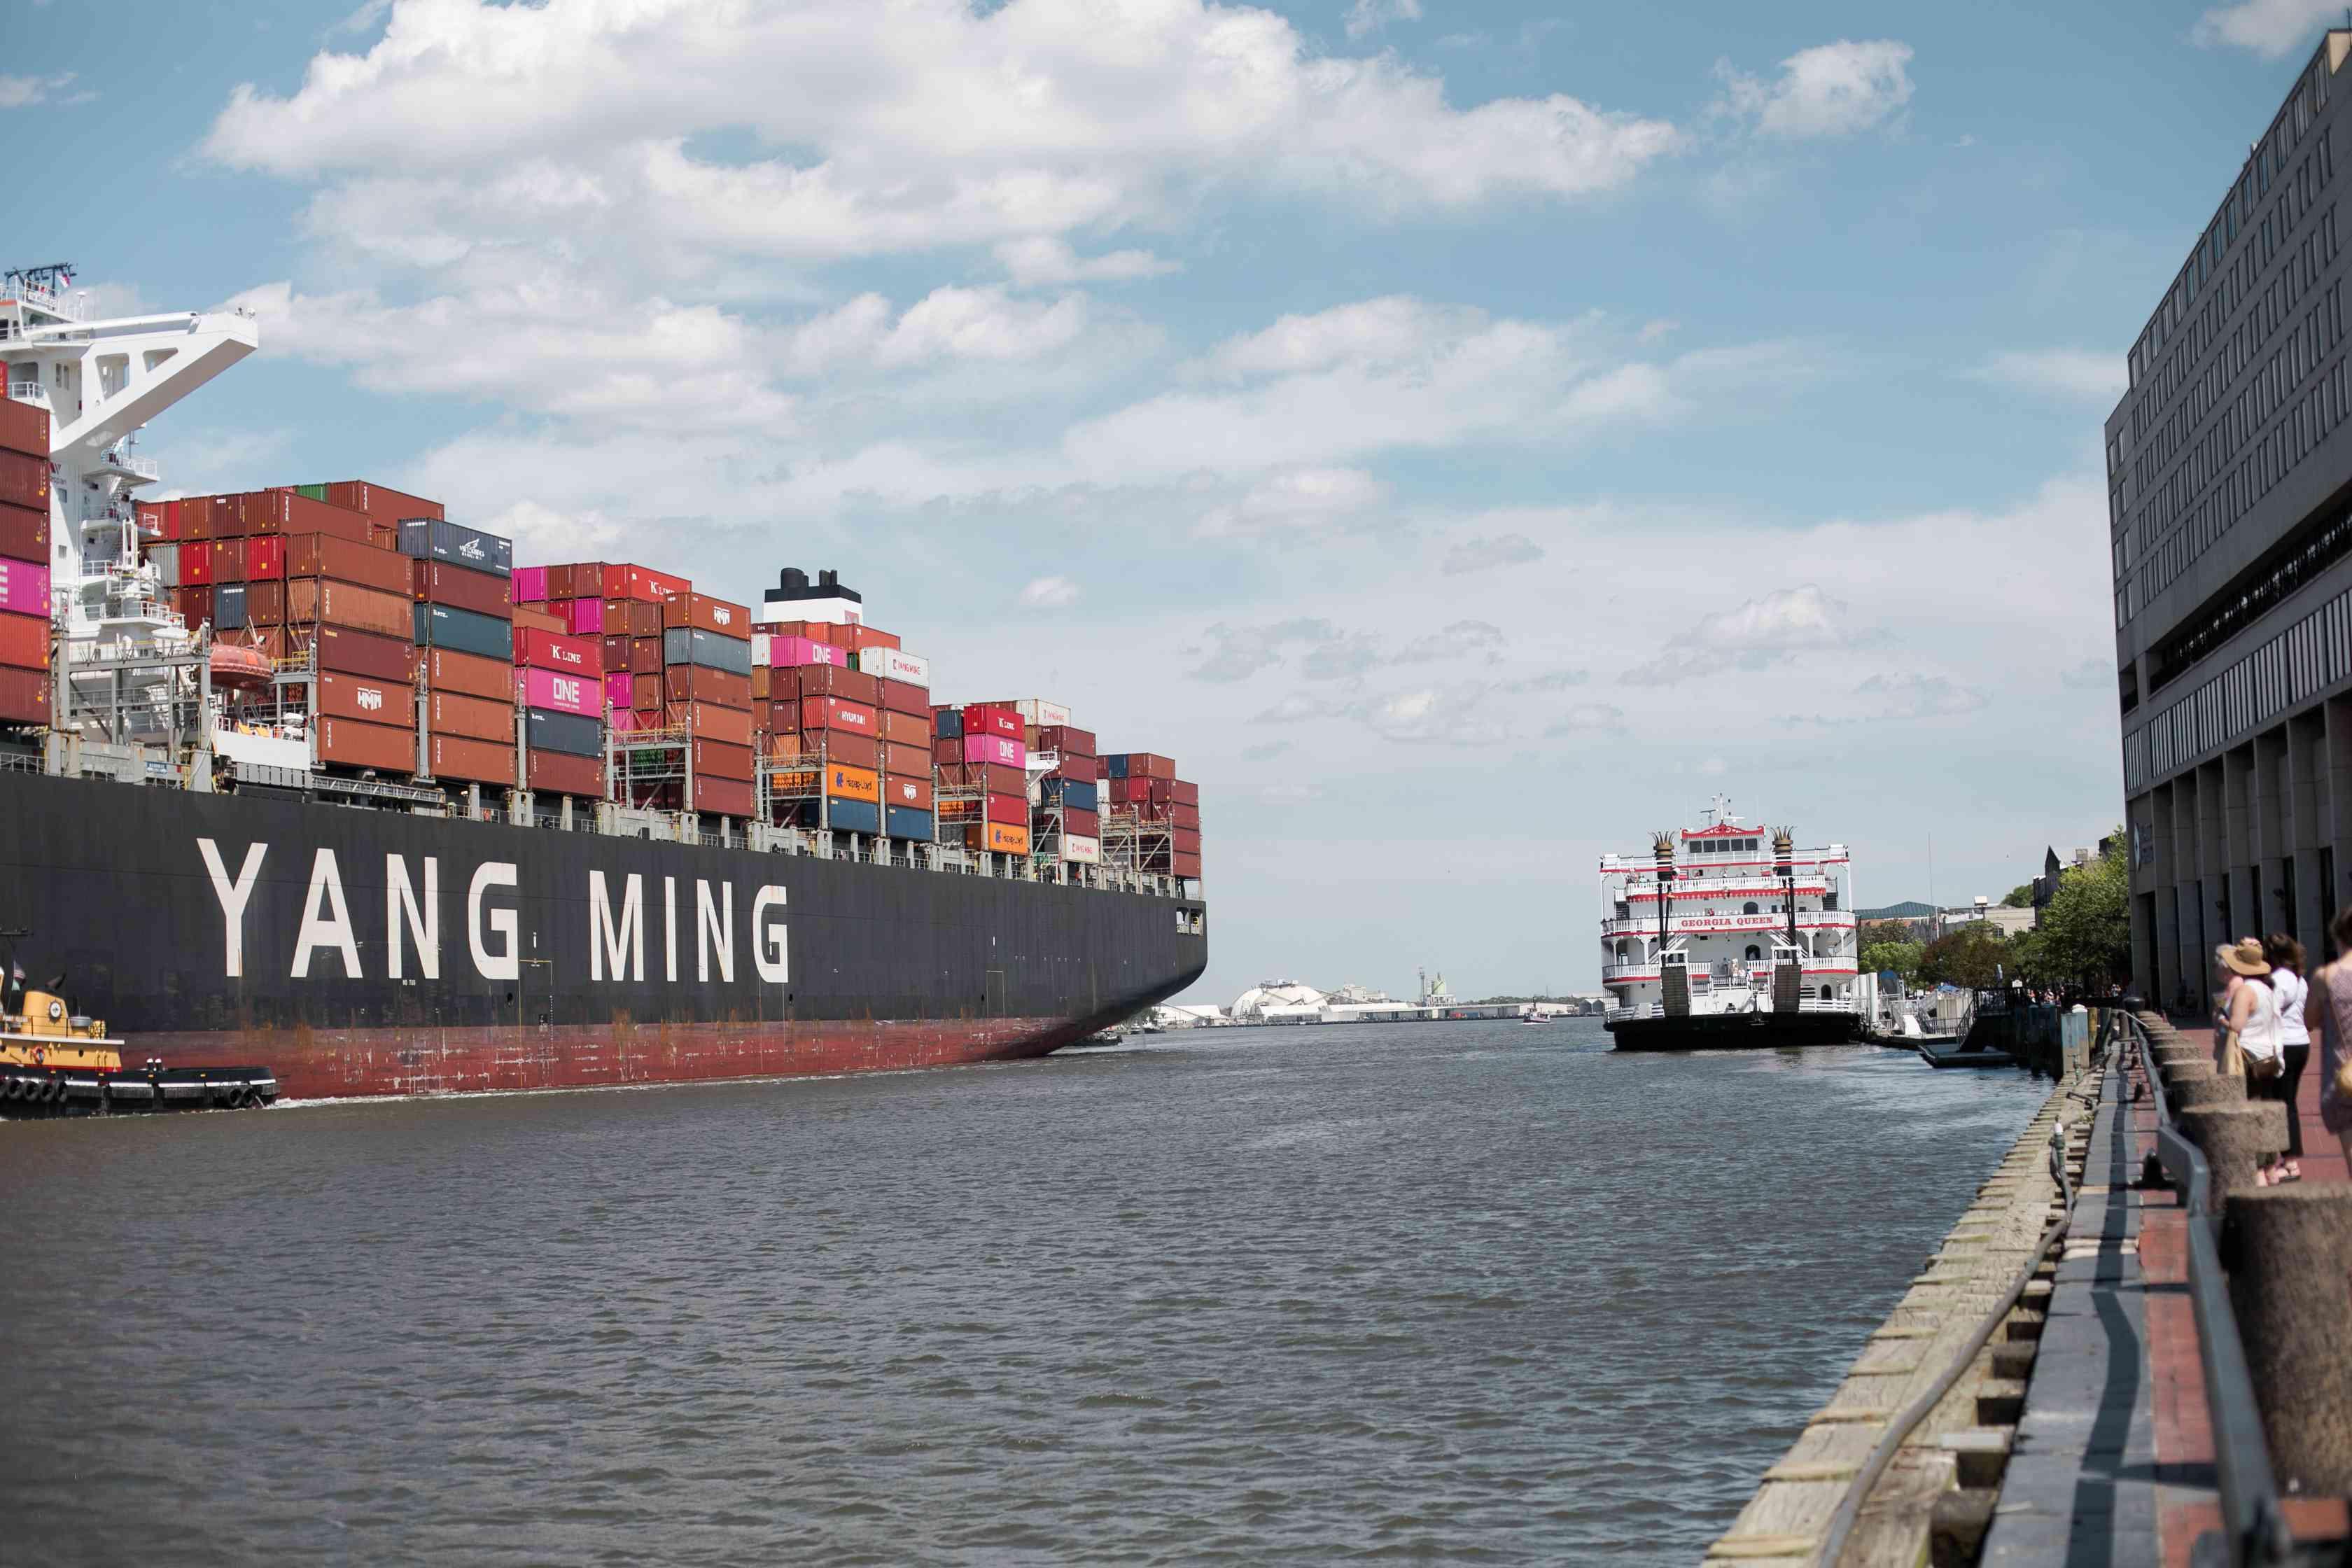 Ships Along the Savannah River in Georgia